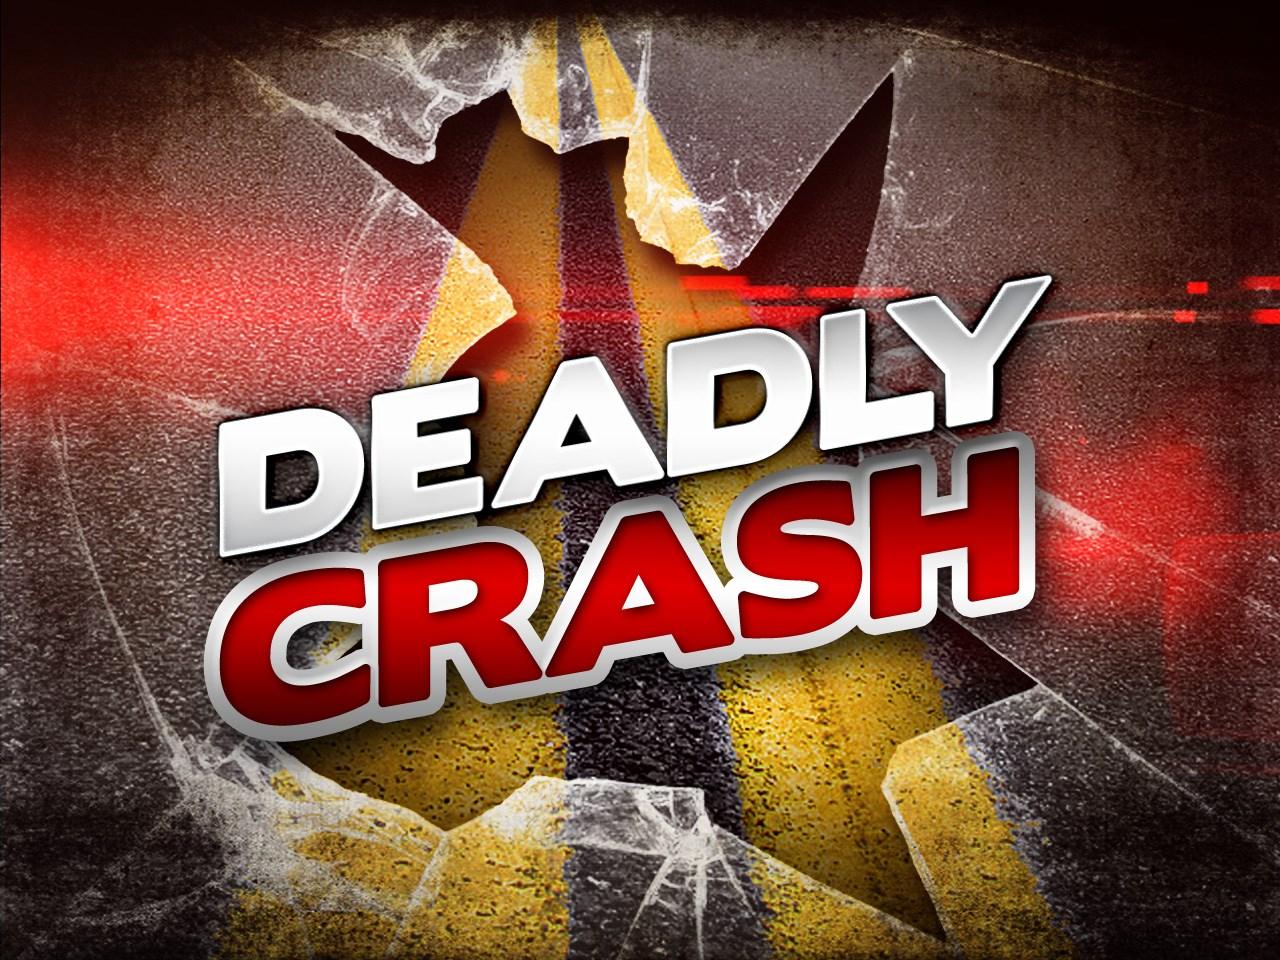 deadly crash_1504221997769.jpg